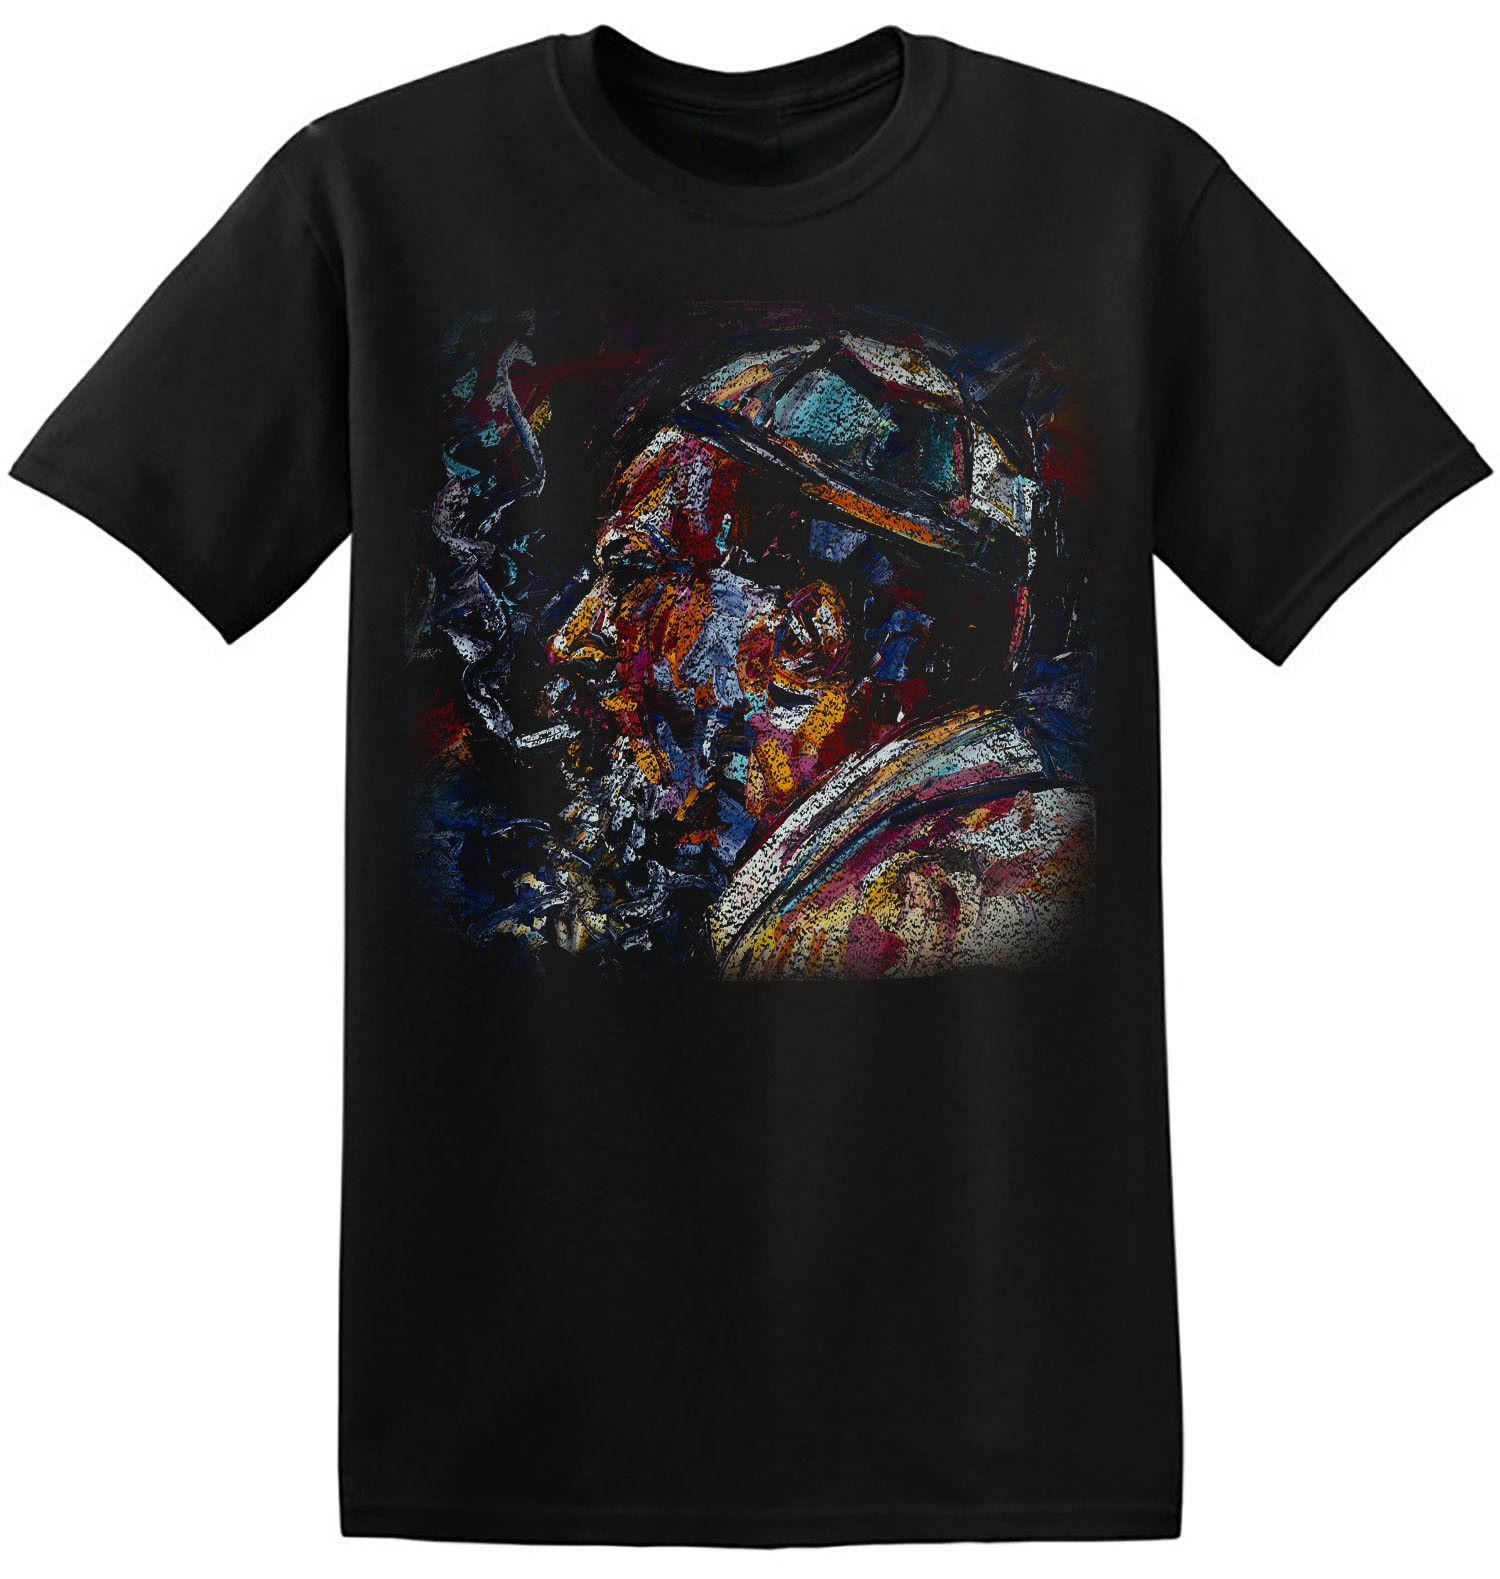 c43ee861d T Shirt Jazz Monk Art Graphic Print Men Cool Retro Black Artist Band Tee 4  A 018 Print T Shirts Men Mens T Shirt Cool Tshirt Designs From  Mayshowstore, ...